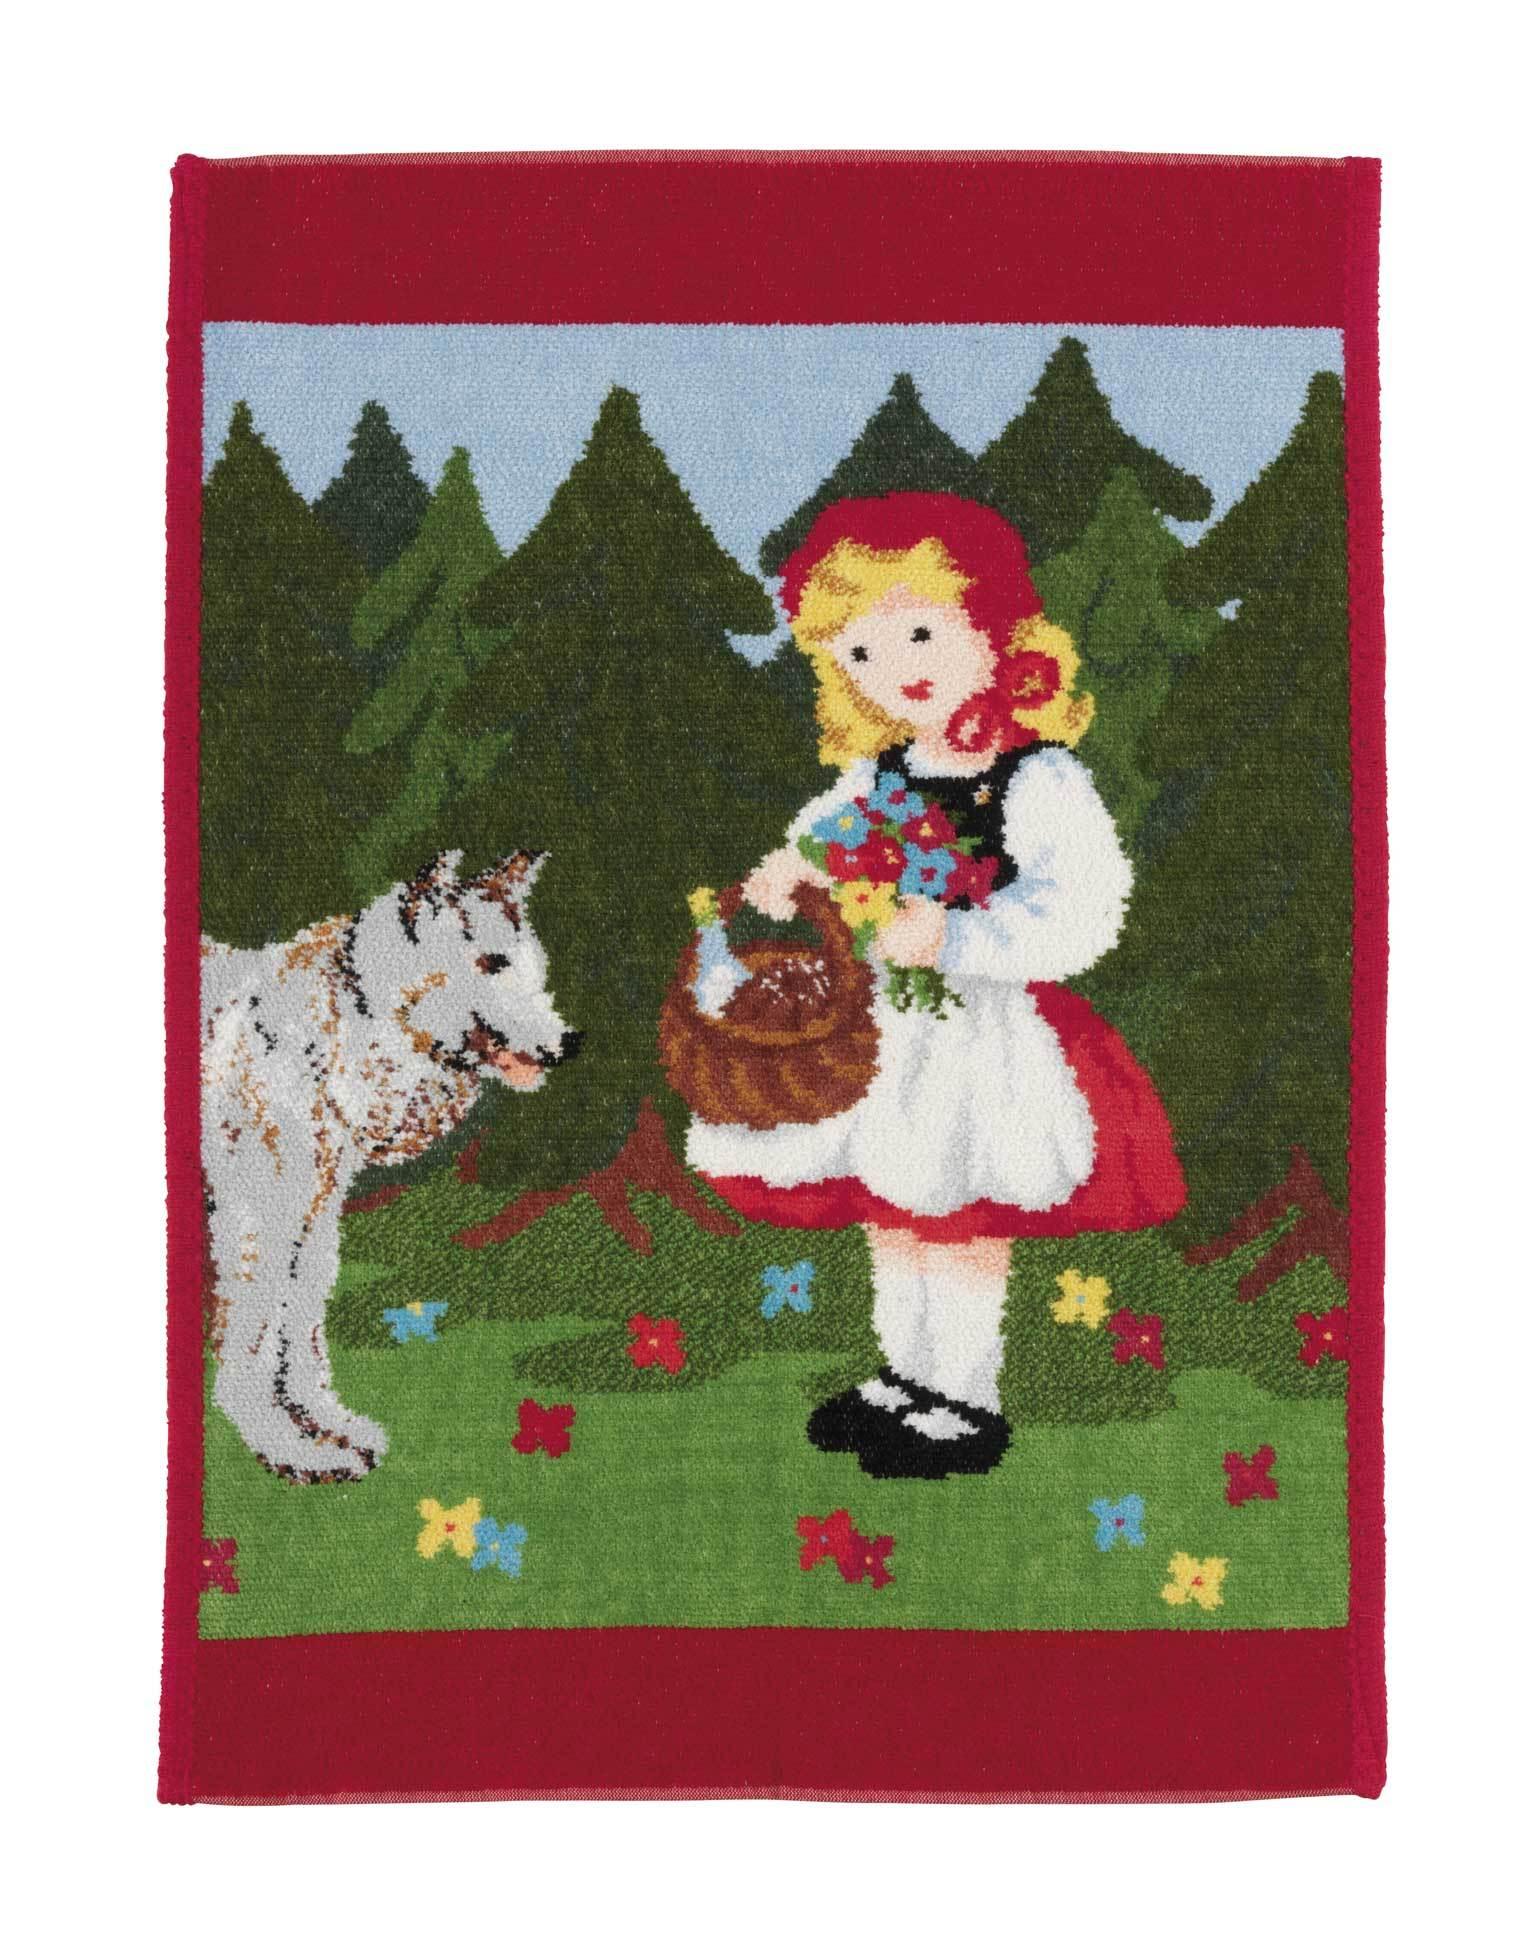 Детские полотенца Полотенце детское 37x50 Feiler Marchen Little Red Riding Hood 120 красное elitnoe-polotentse-detskoe-shenillovoe-marchen-little-red-riding-hood-120-krasnoe-ot-feiler-germ.jpg